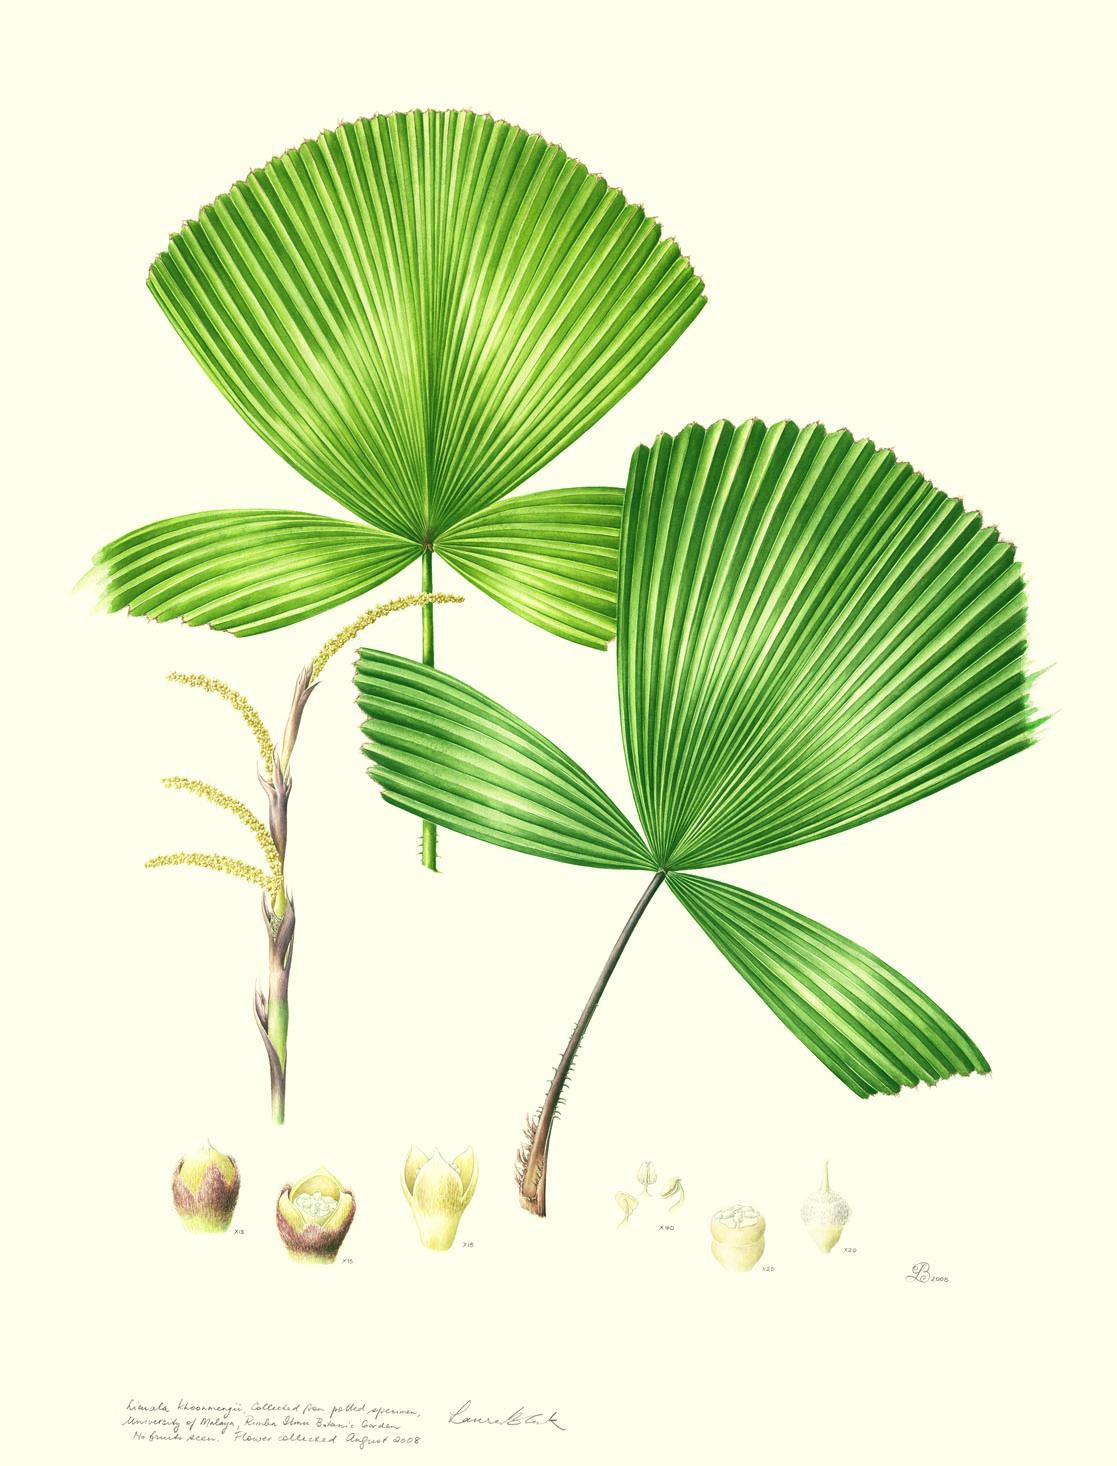 Licuala khoonmengii